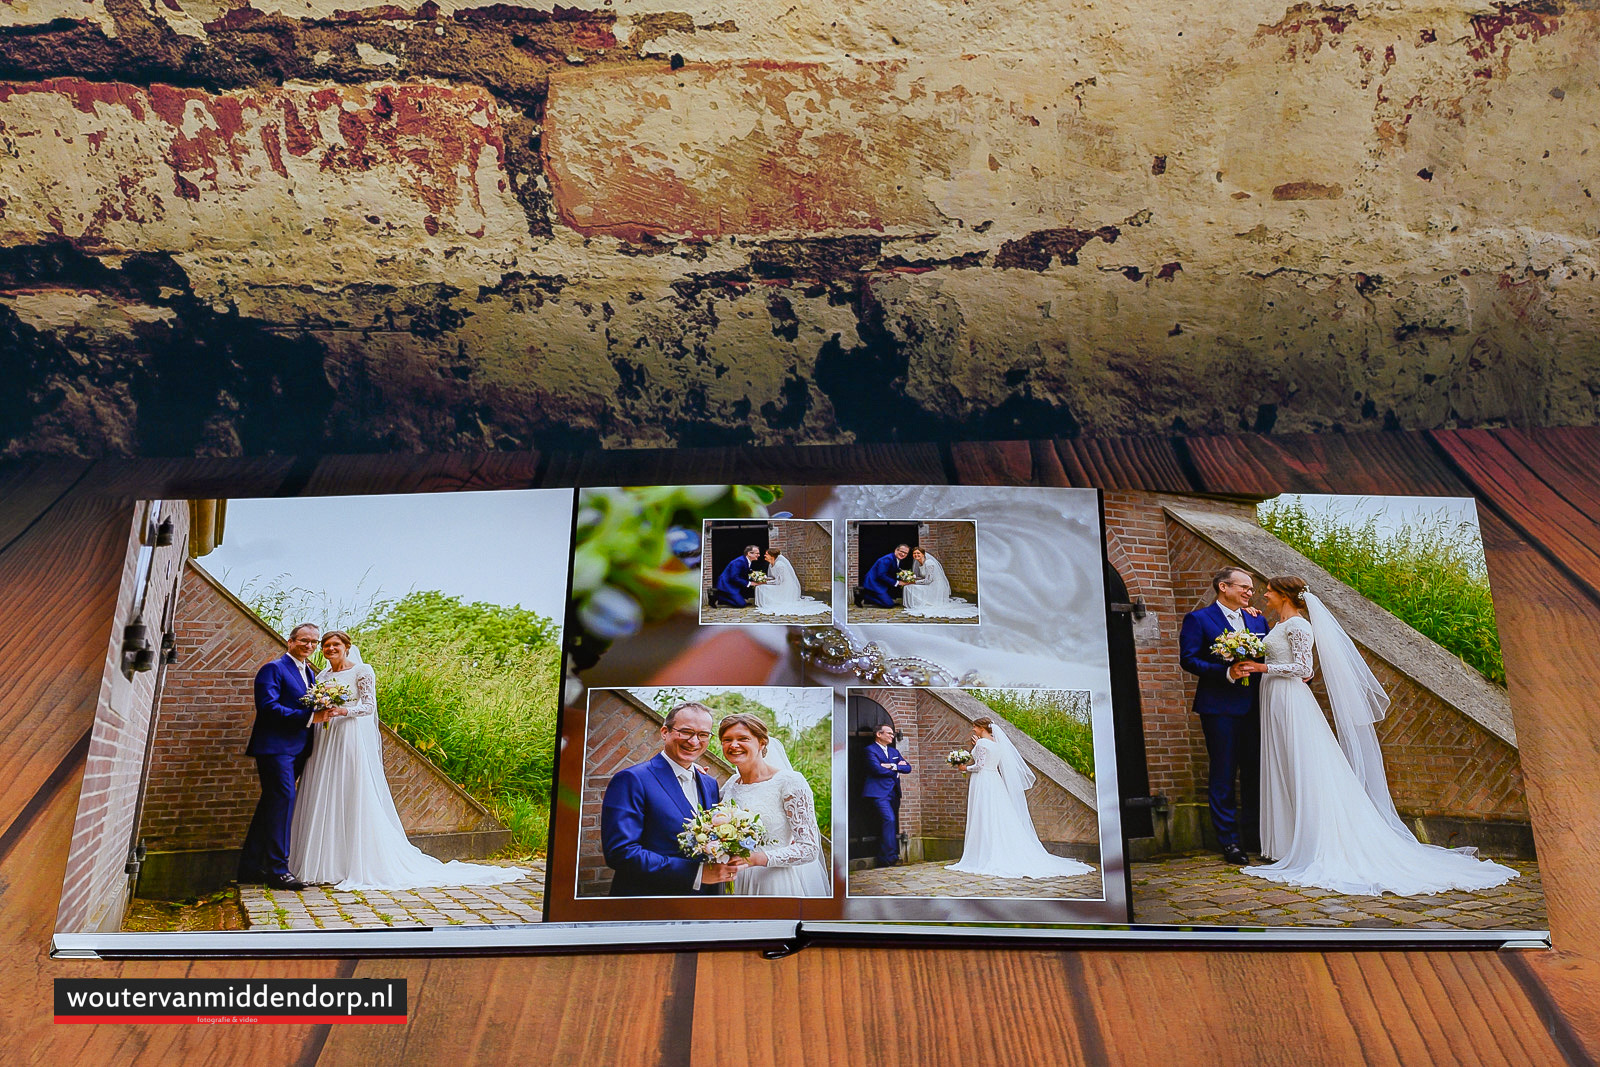 trouwalbum, bruidsreportage, trouwfotograaf, groepsfoto, fotograaf, Wouter van Middendorp, Veluwe, Uddel, Lunteren, (6)